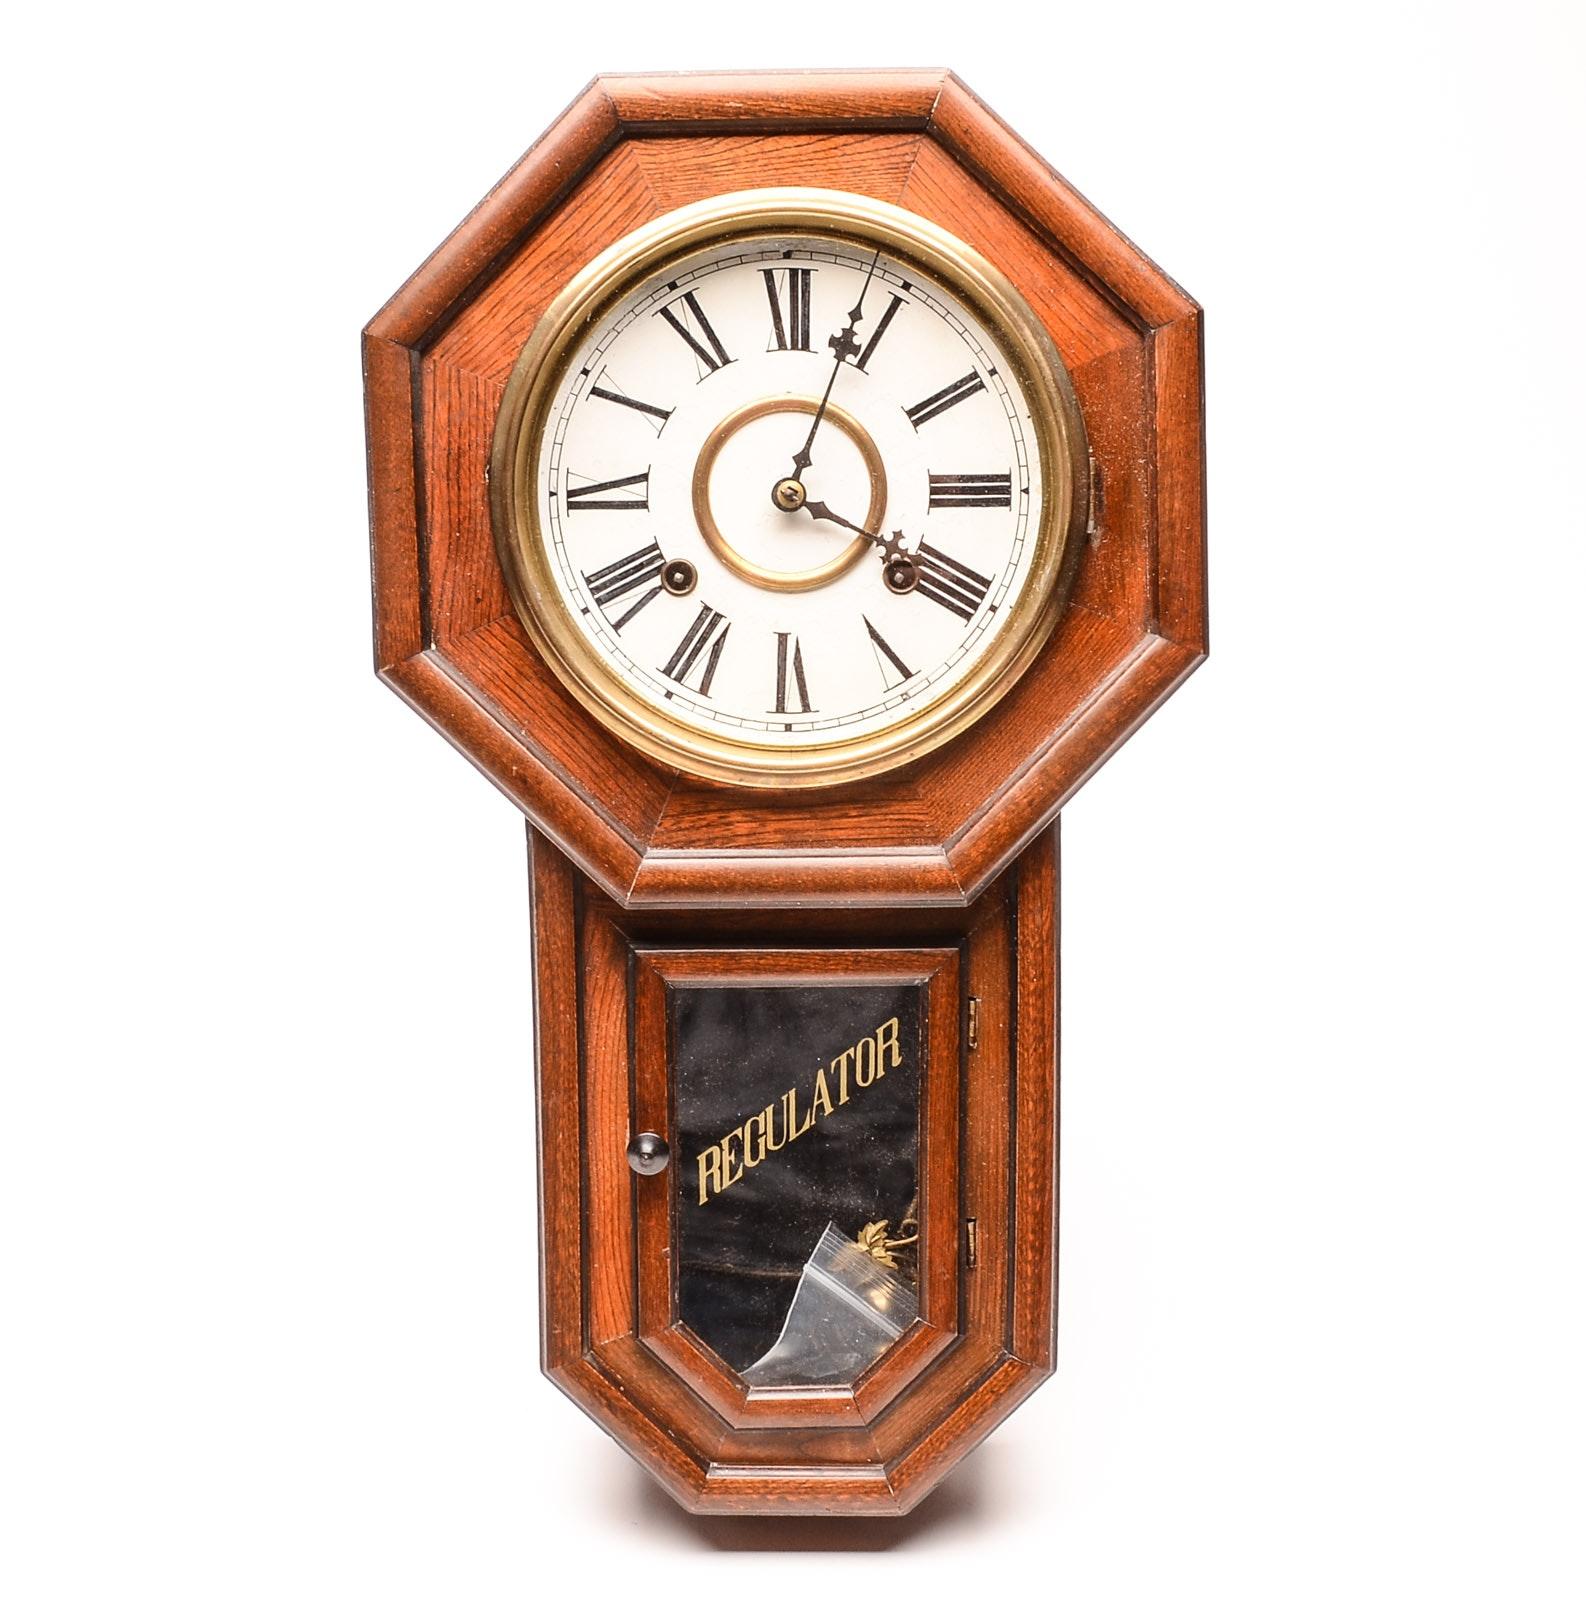 Early 20th Century Aichiken Japanese Regulator Wall Clock